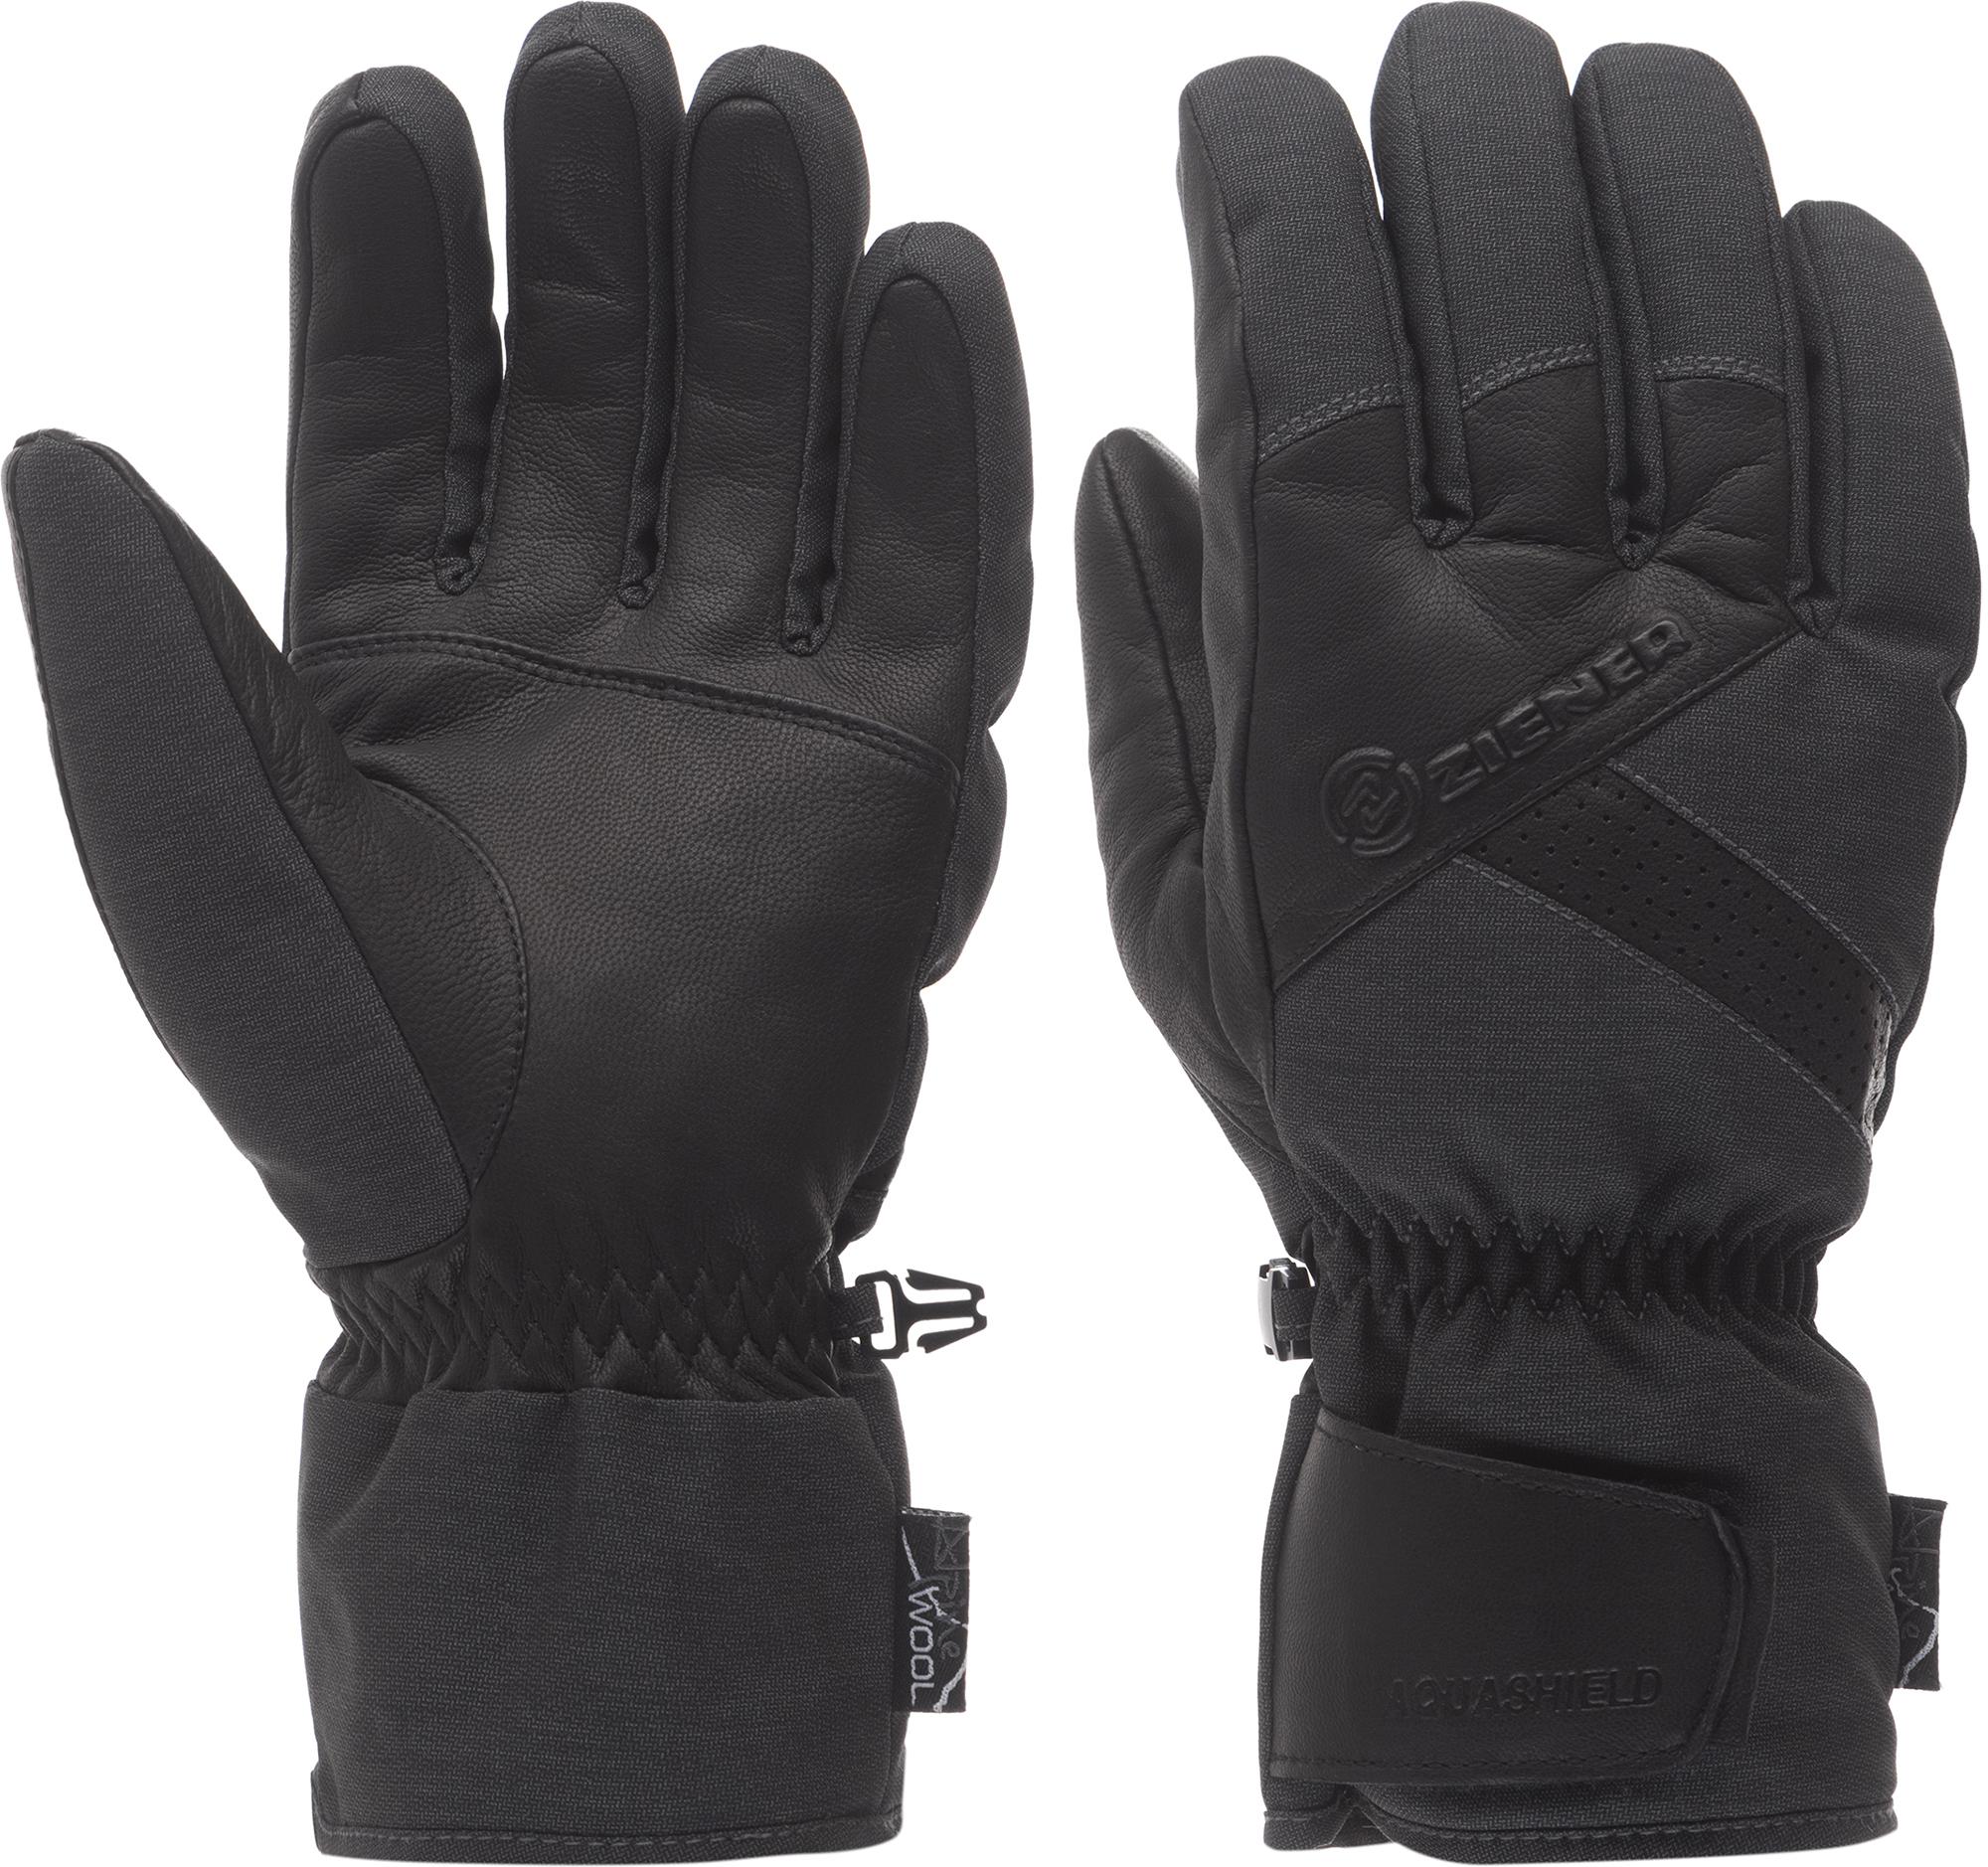 Ziener Перчатки мужские Ziener Getter, размер 8 ziener перчатки мужские ziener gliss gtx размер 9